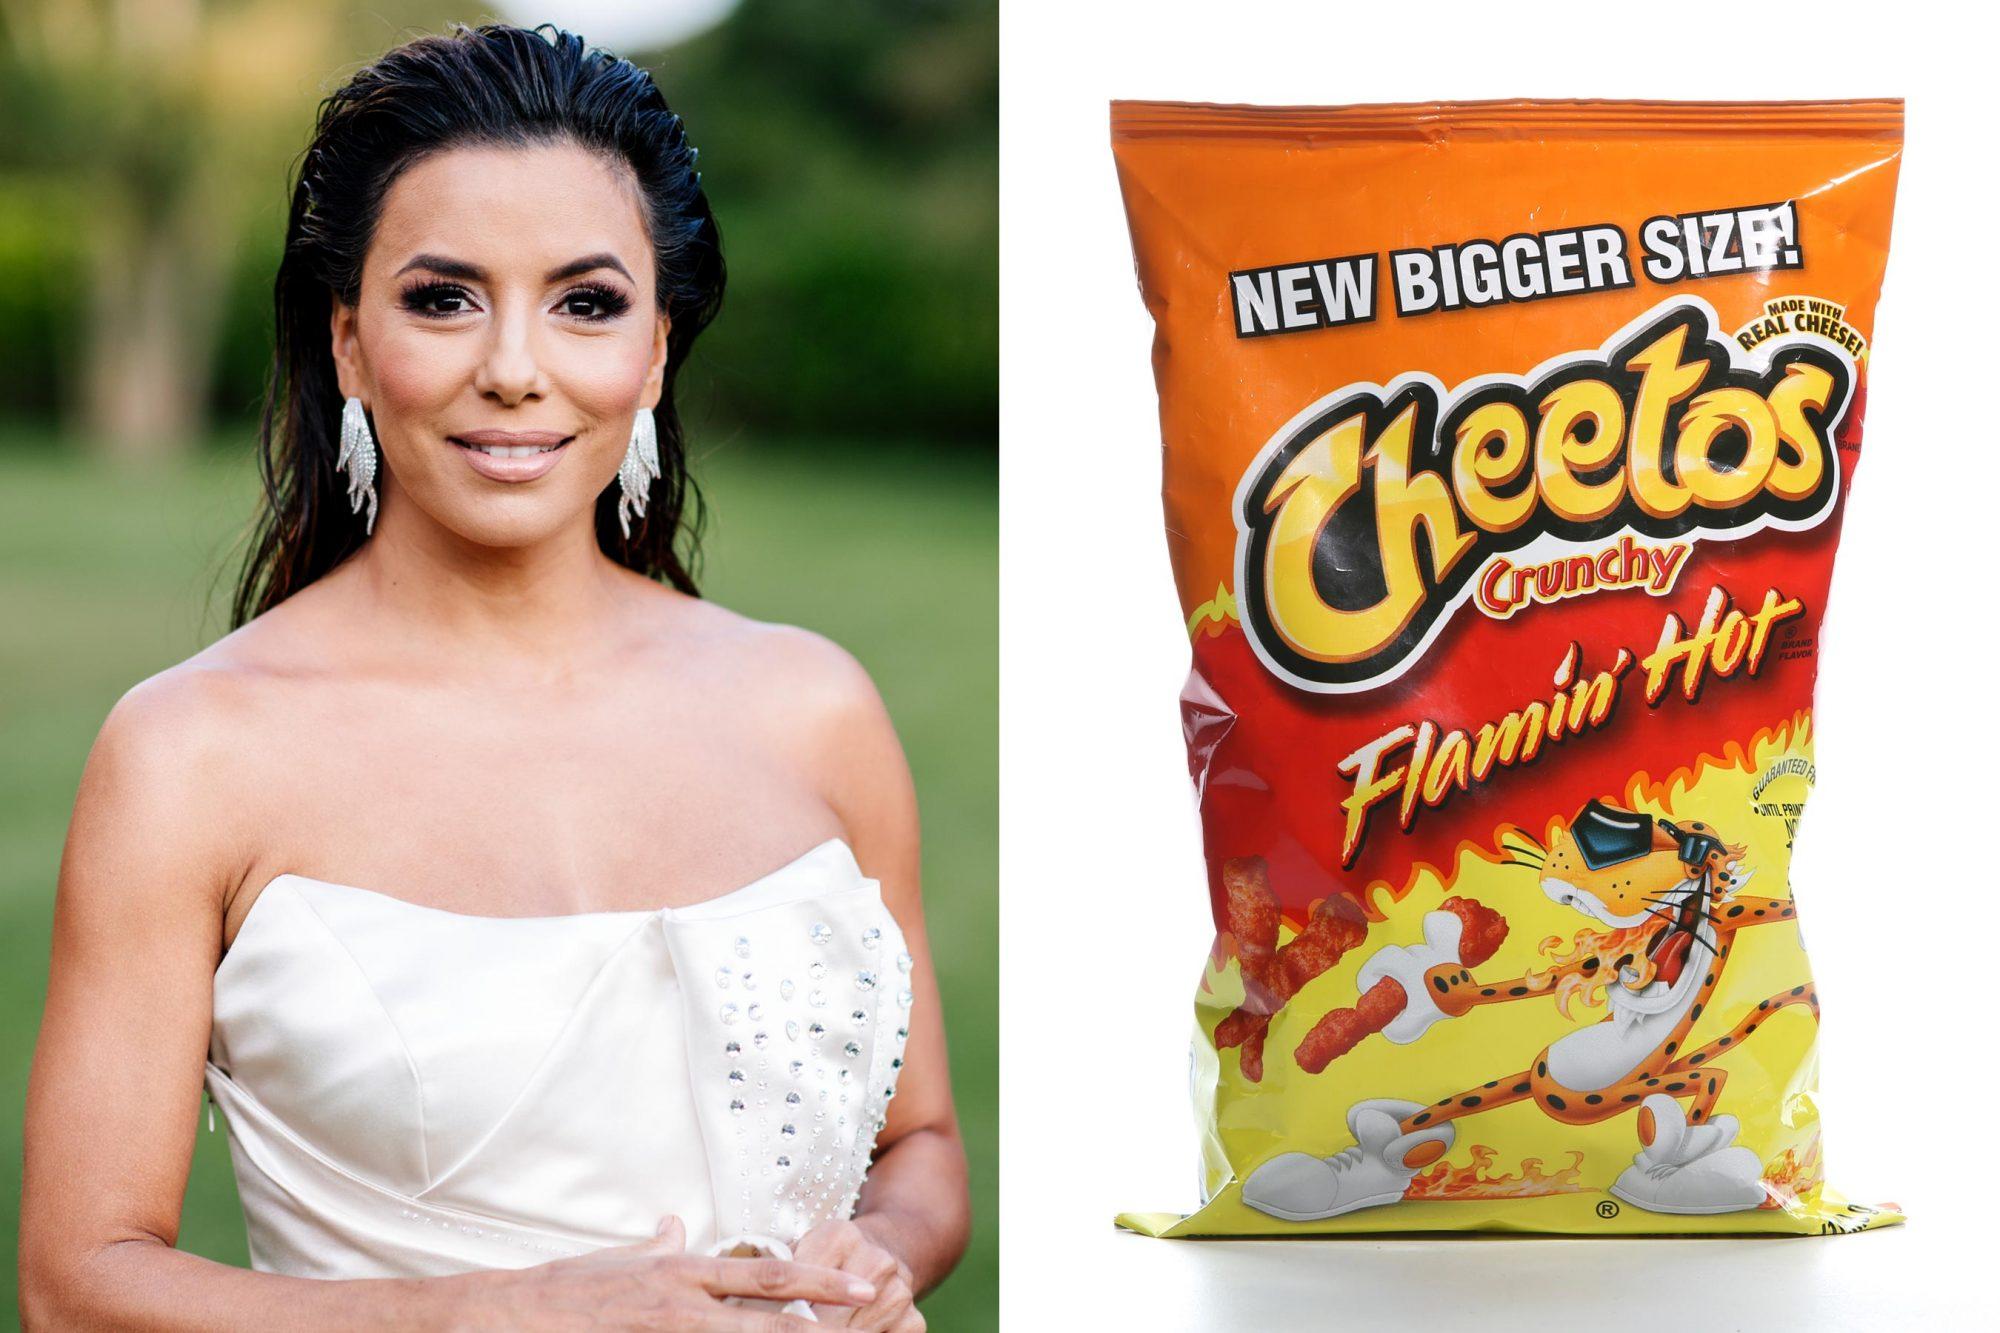 Eva Longoria / Flamin' Hot Cheetos